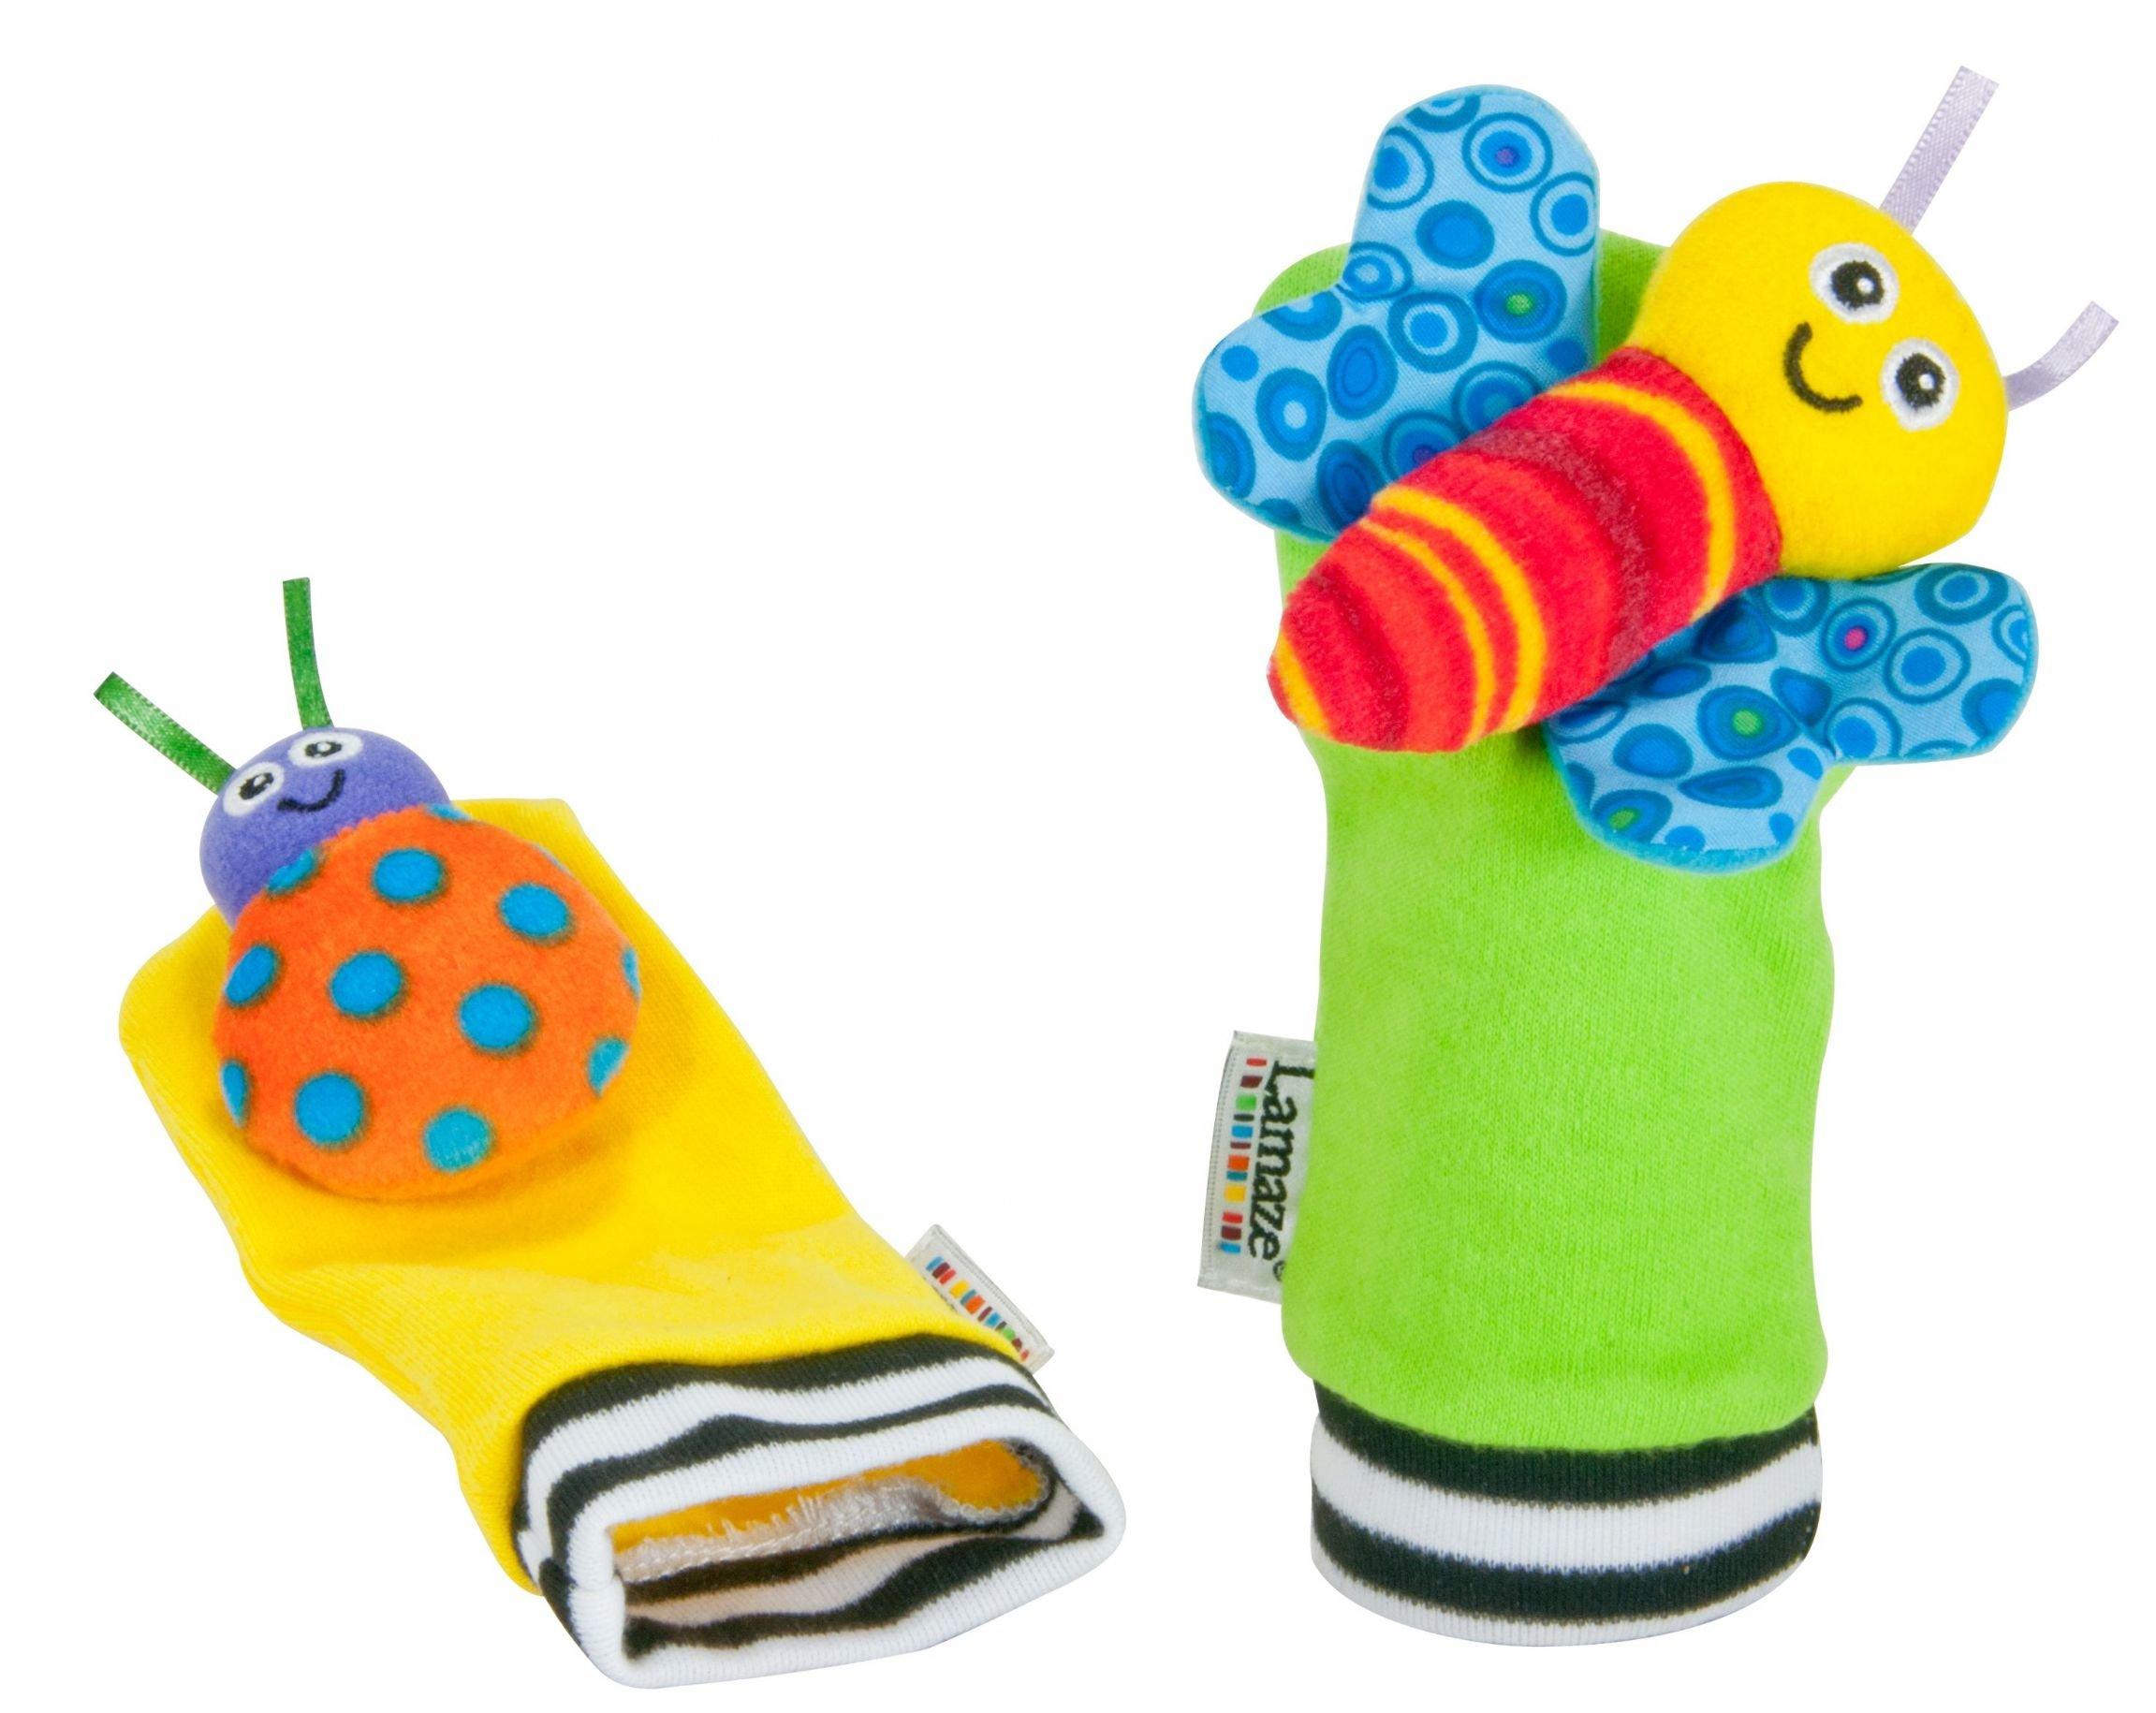 Lamaze developmental baby toys The full range best prices